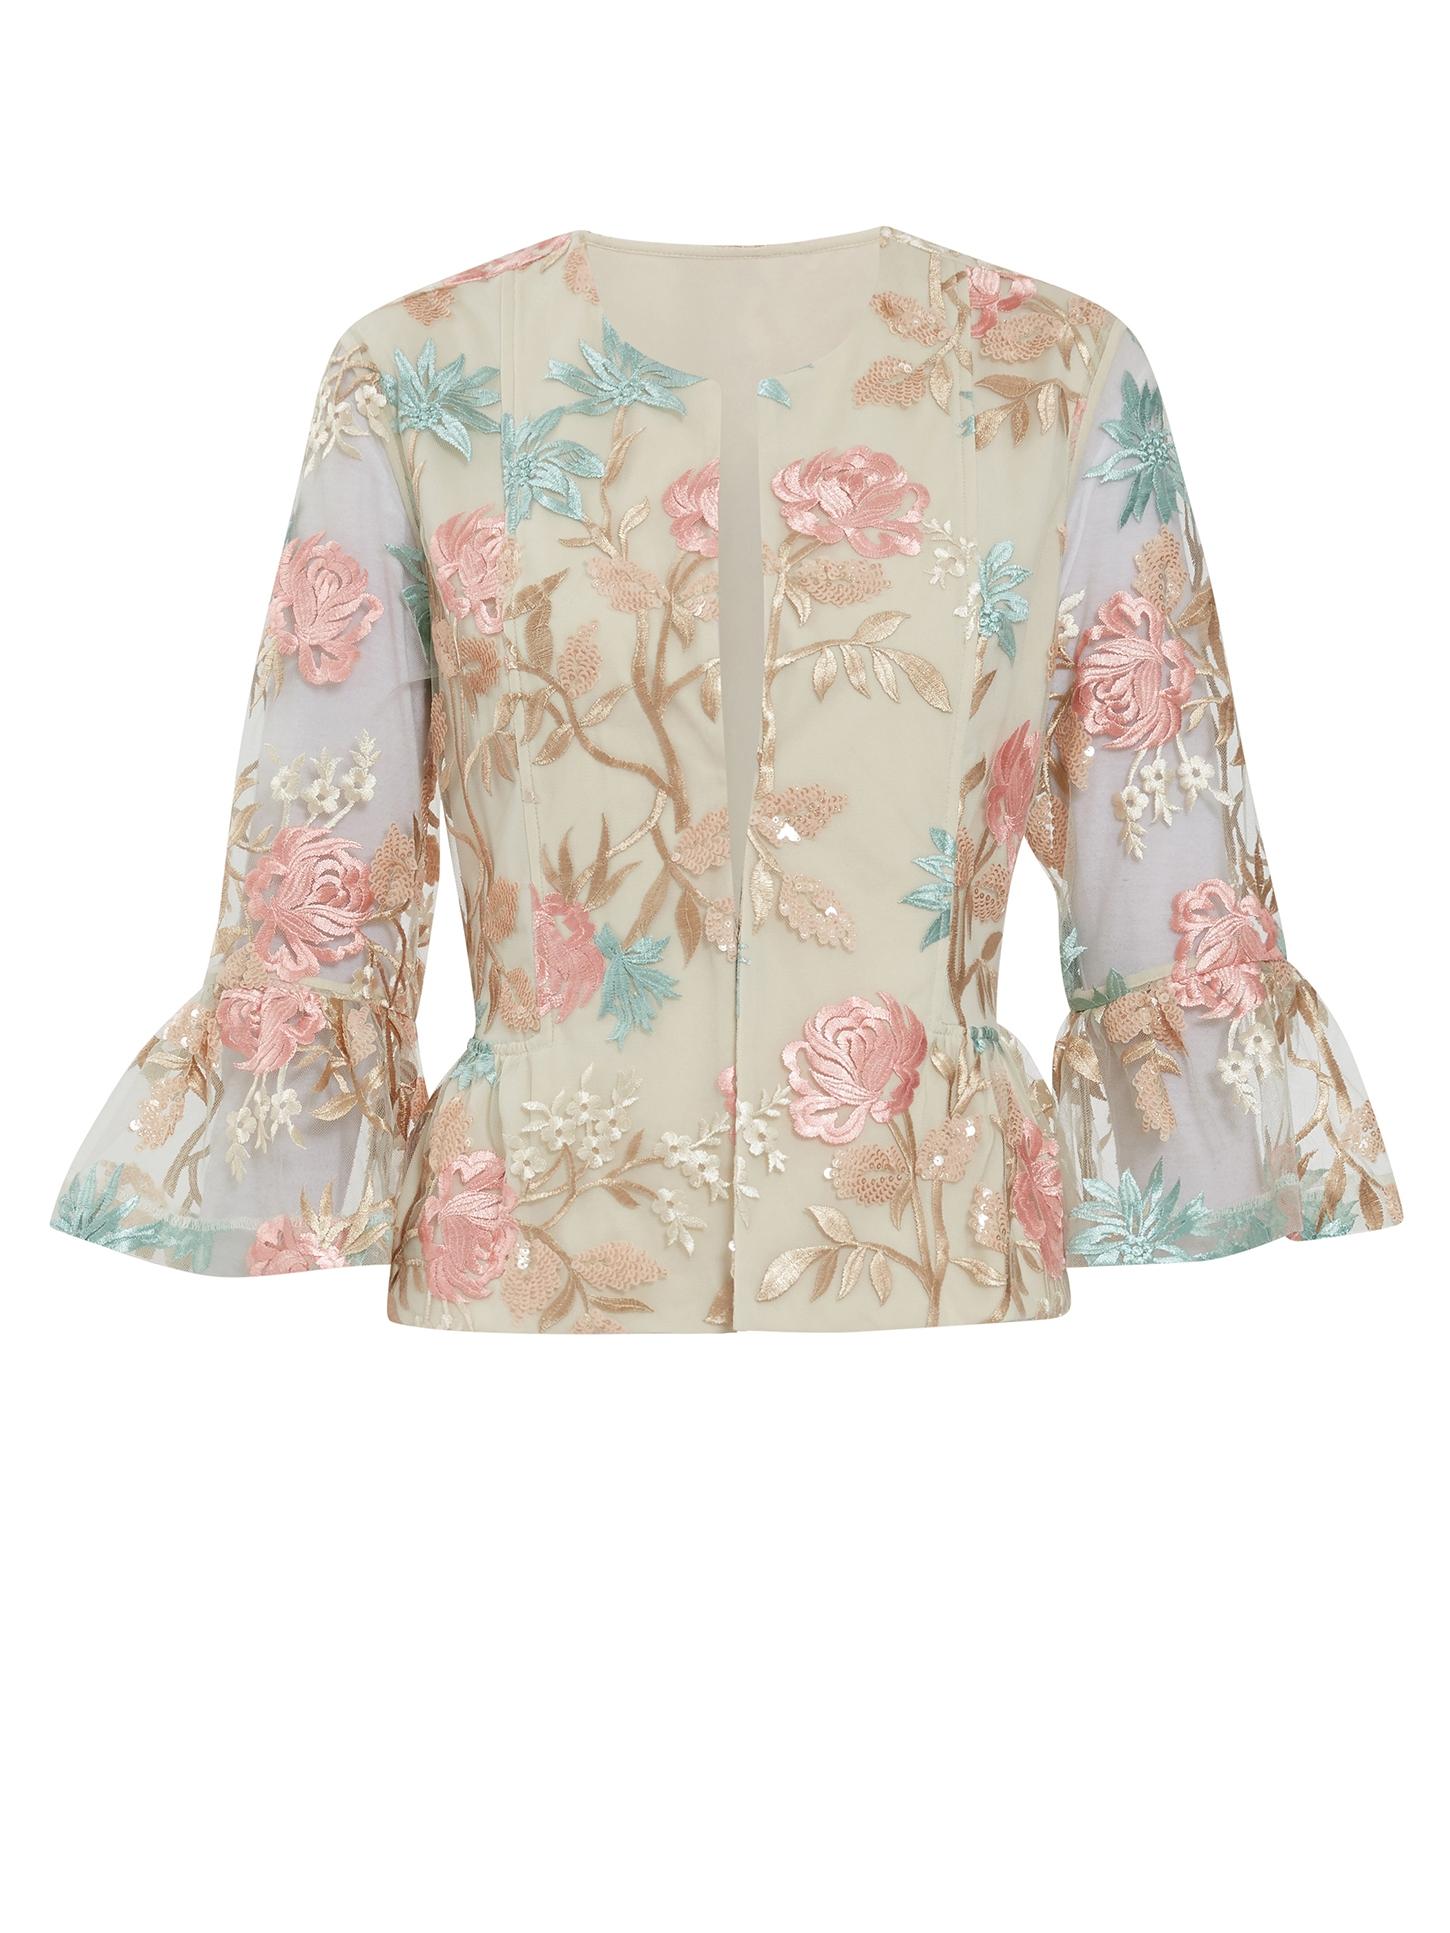 Ottilia Embroidered Jacket